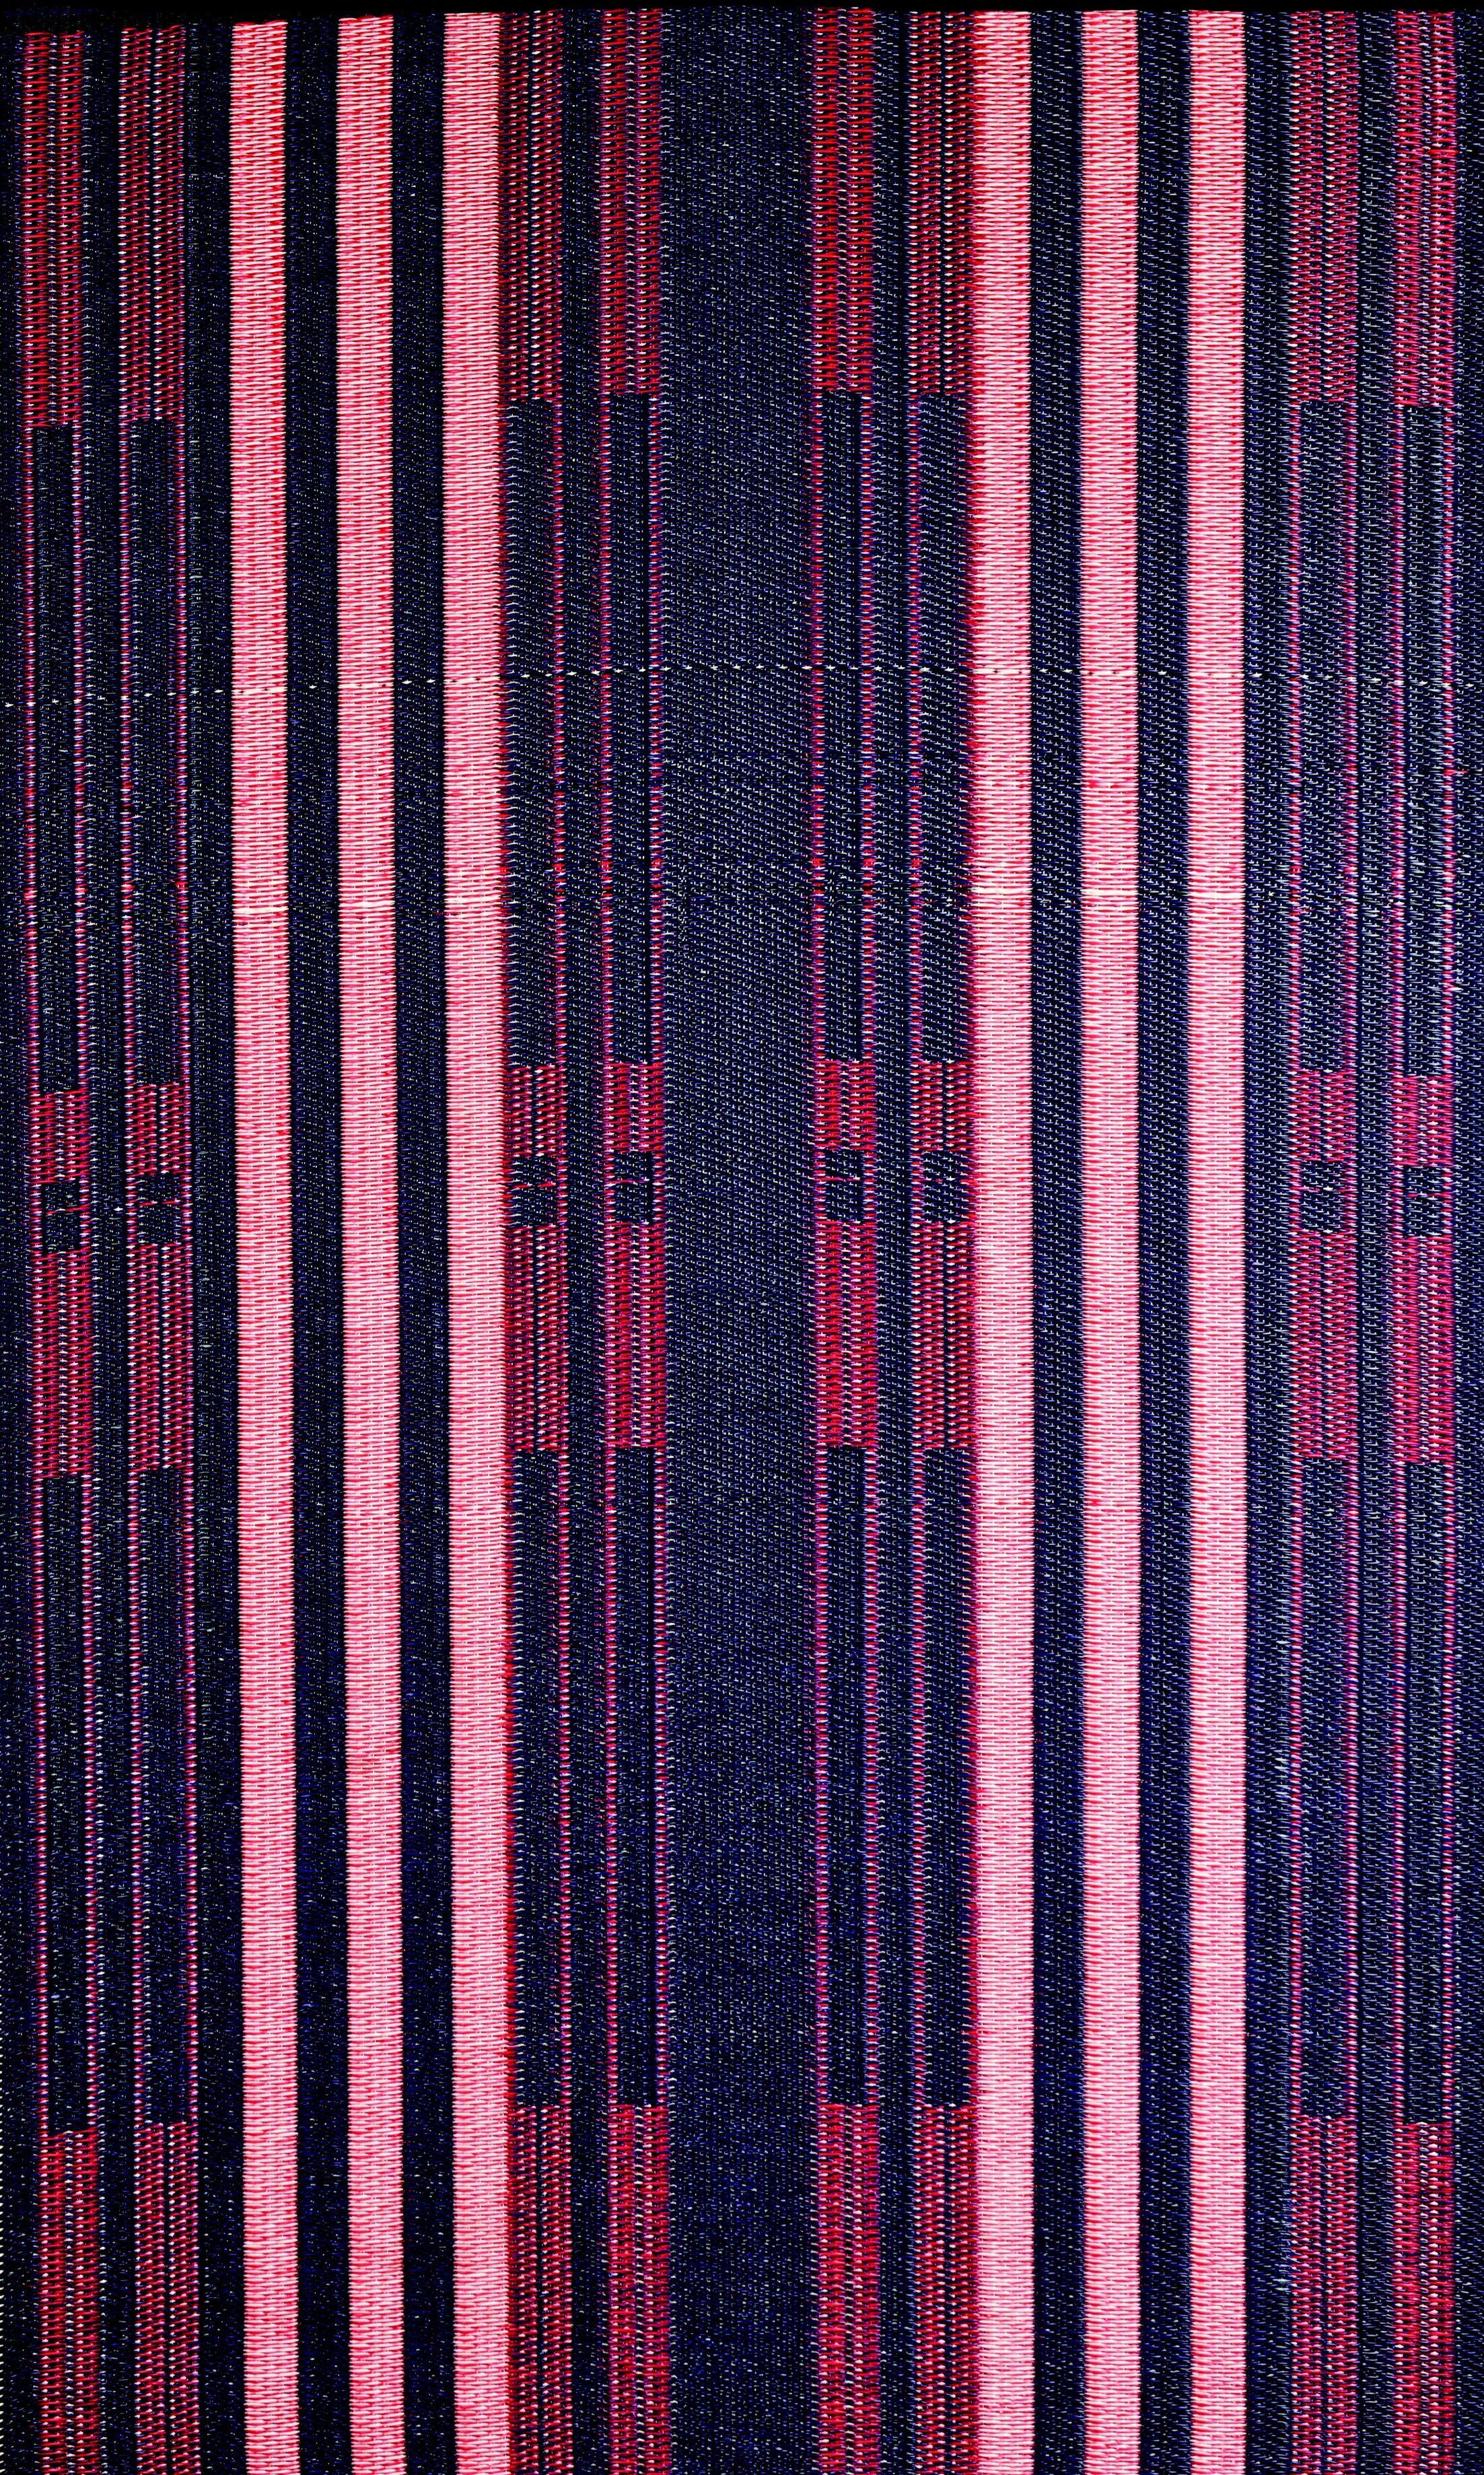 Brick Lane Reversible Design Blue/Red Outdoor Area Rug Rug Size: 6' x 9'